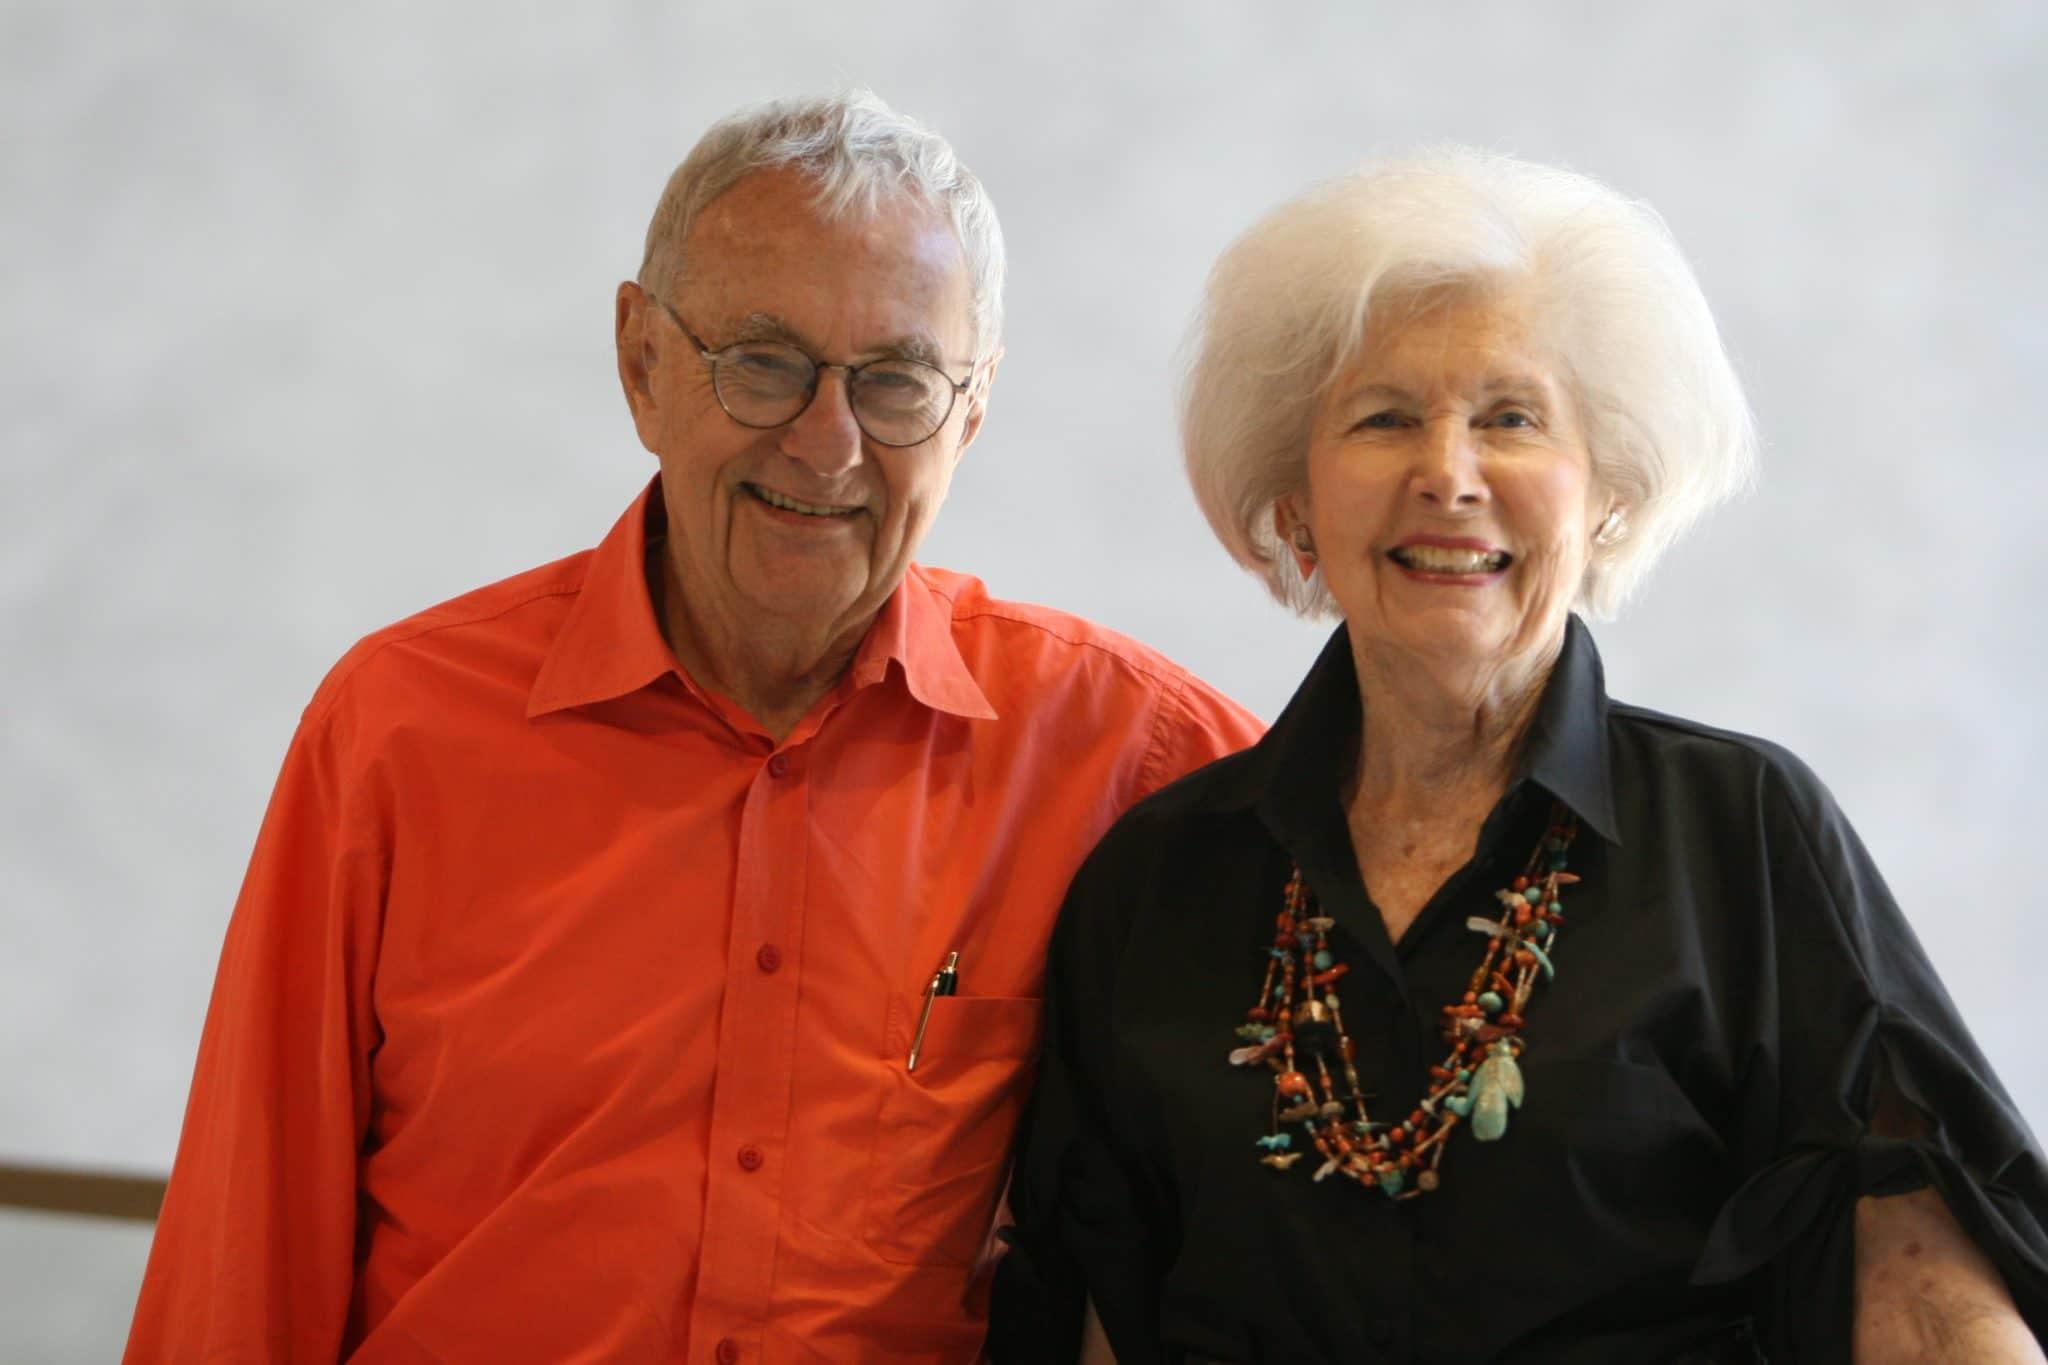 Bill and Hazel Hough